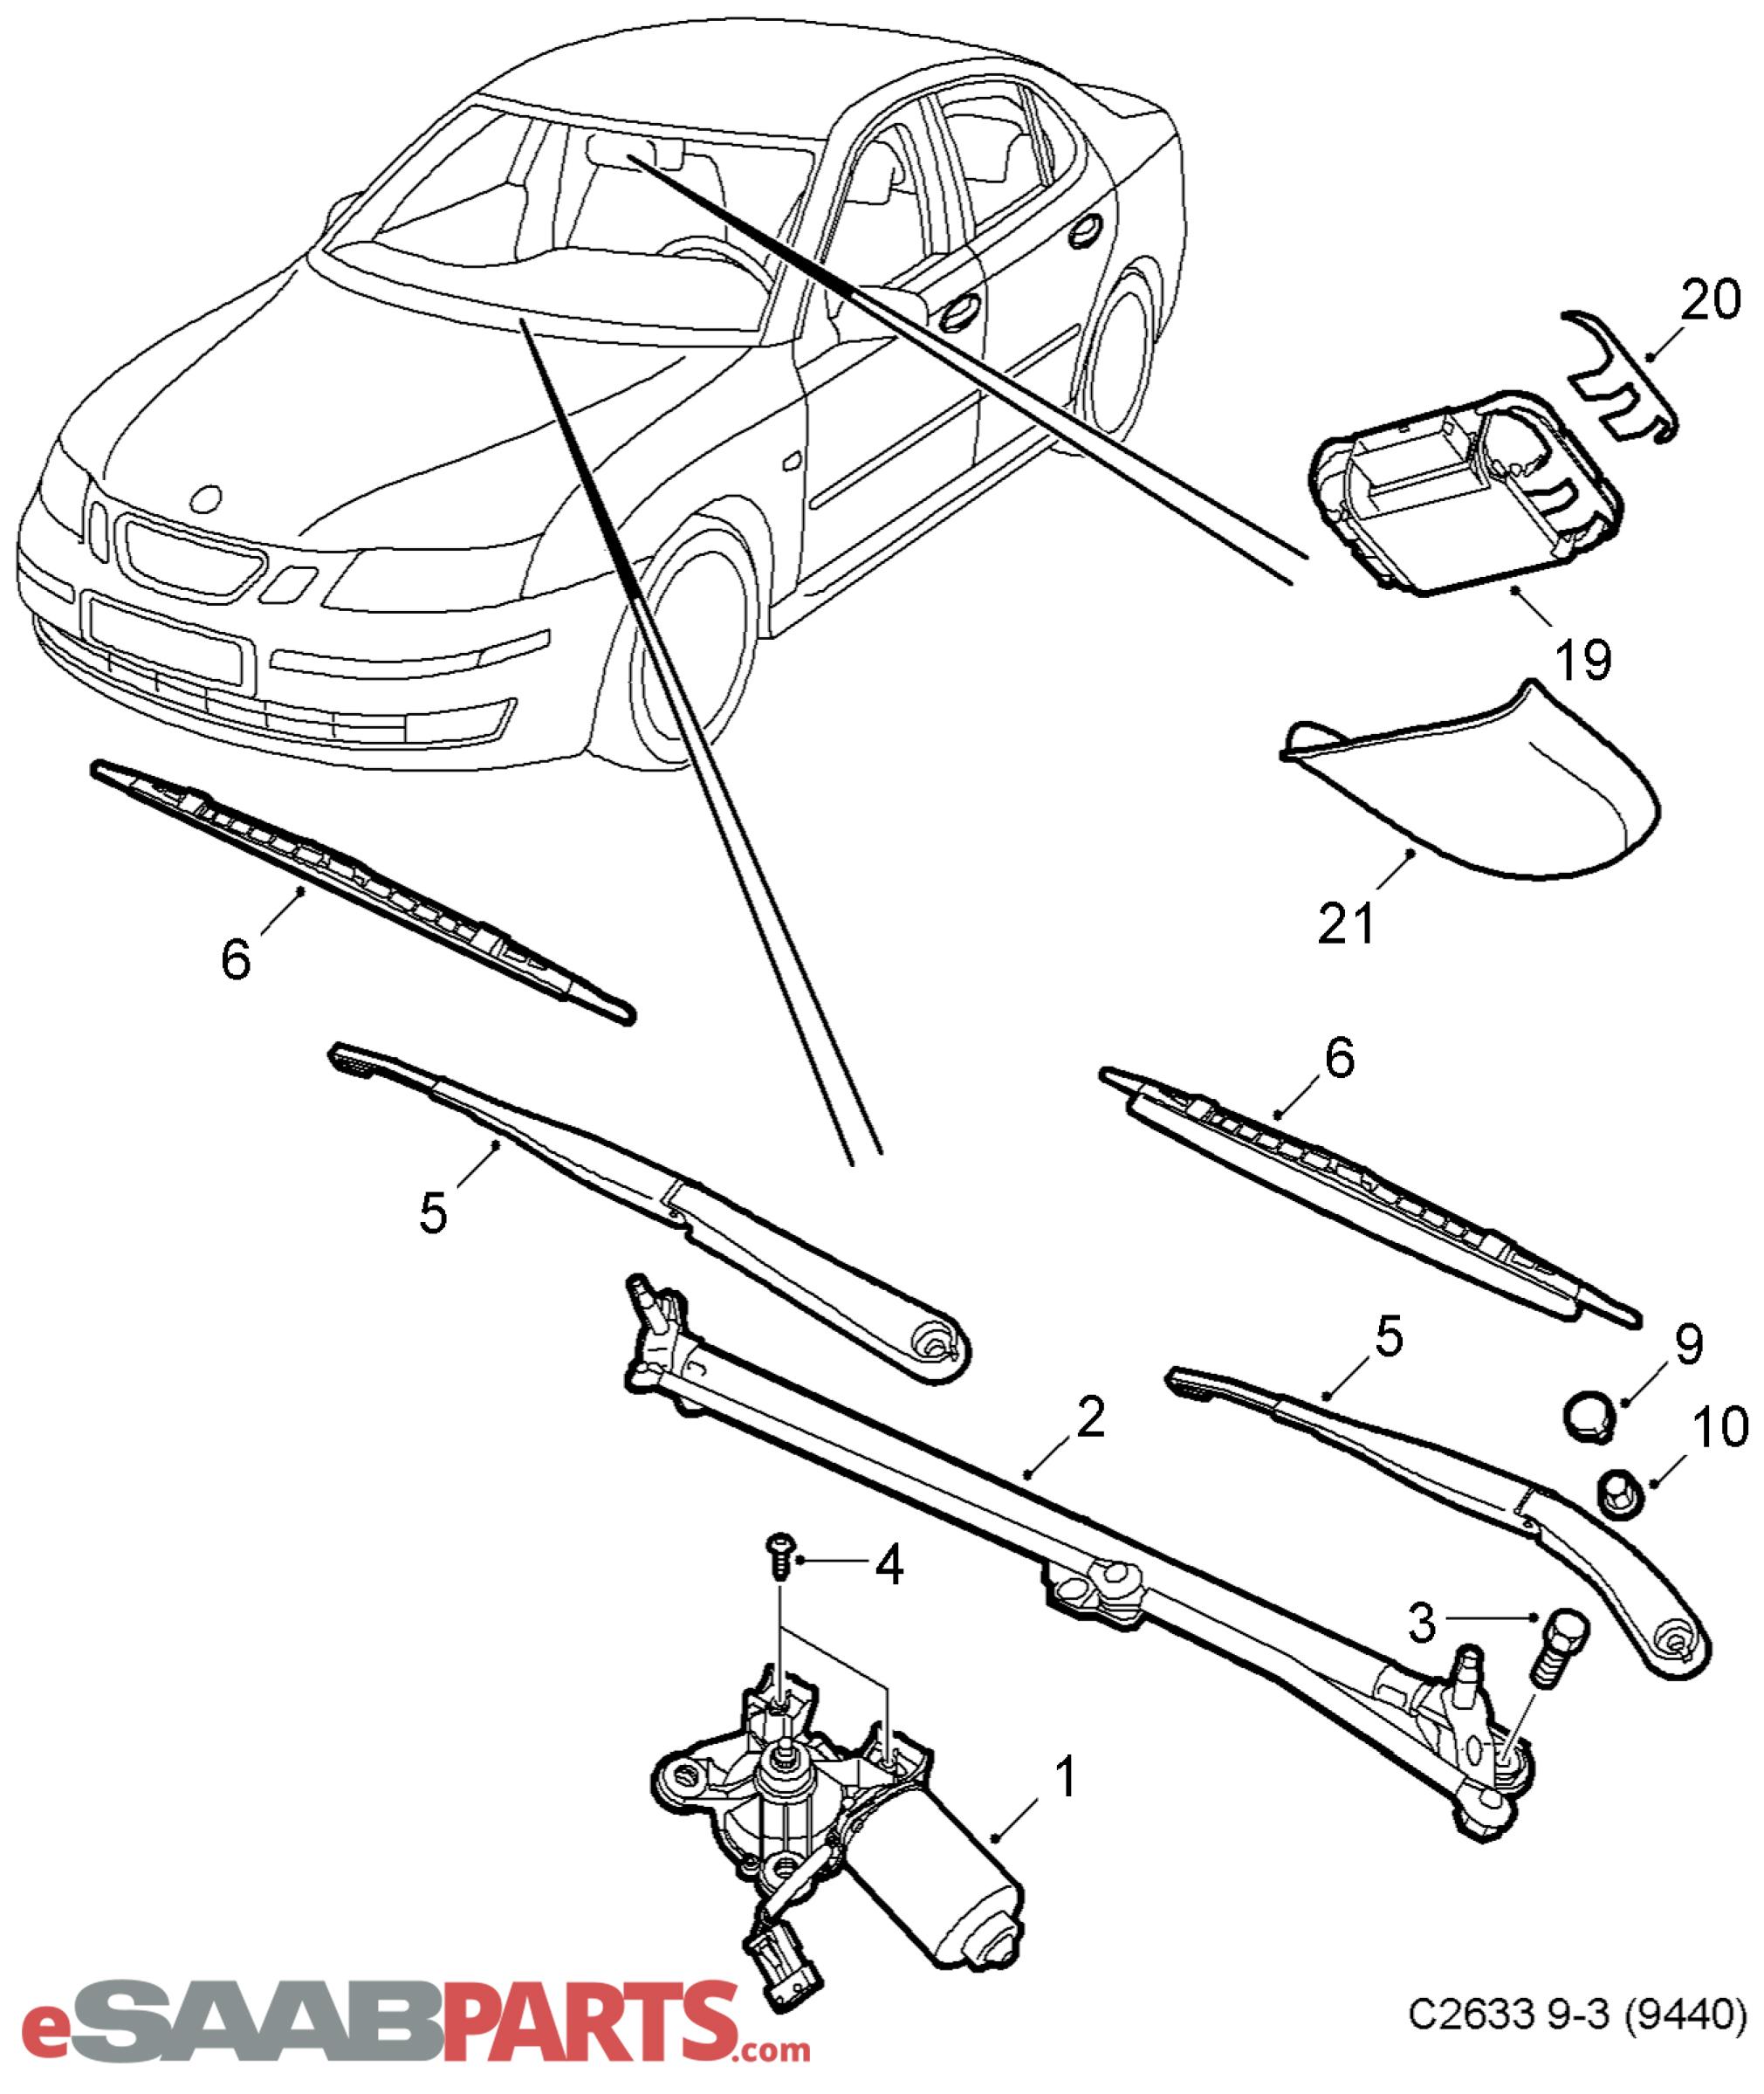 [12778383] SAAB Wiper Blade Kit, LH and RH Side, 08-12